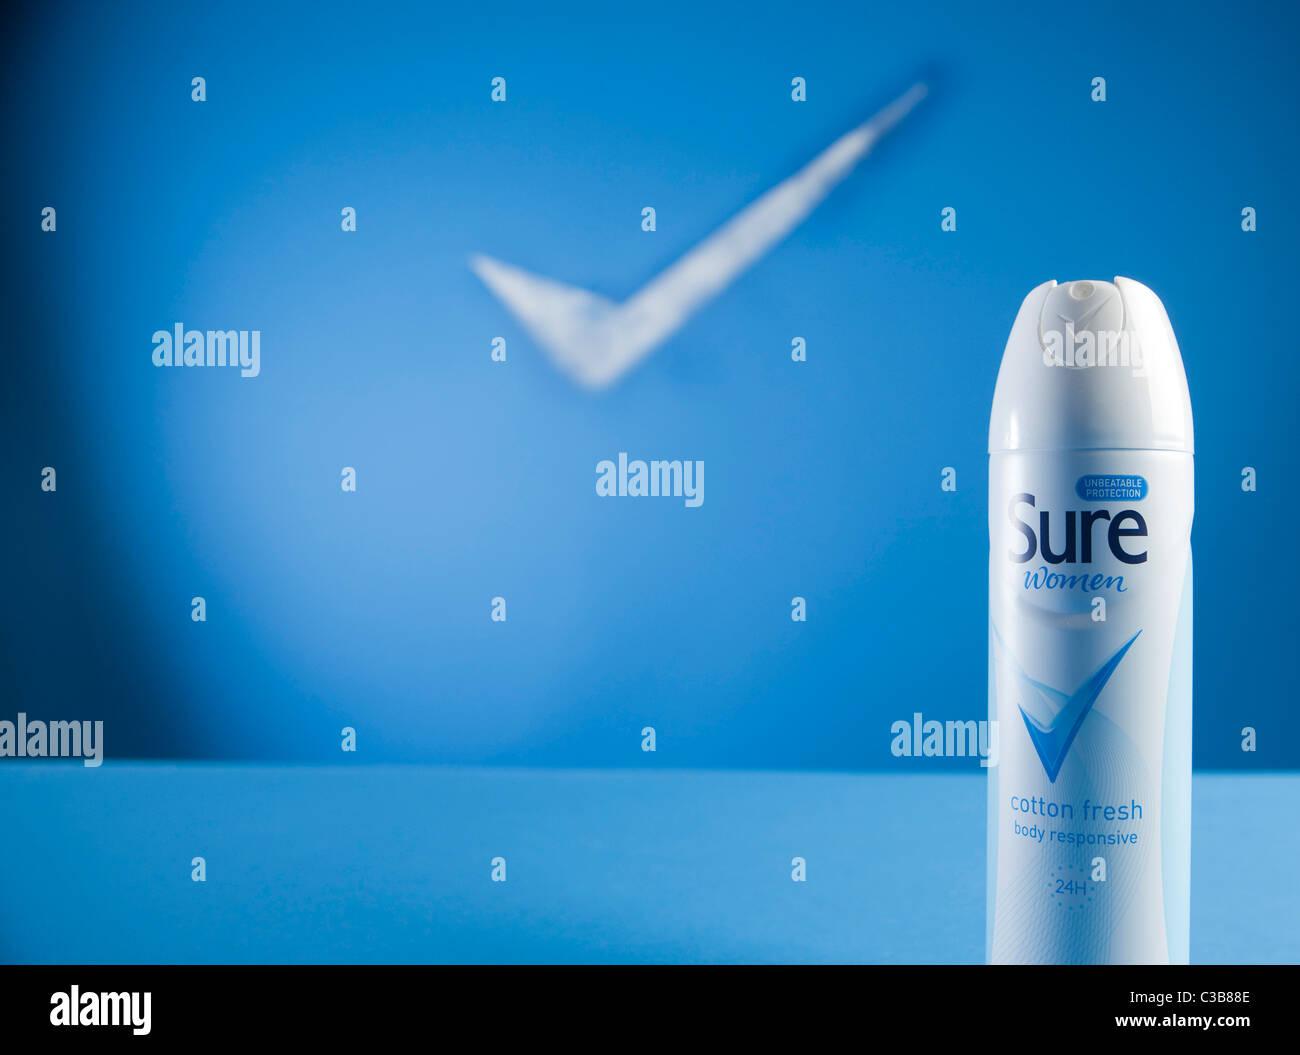 Illustrative image of Sure Women deodorant. A Unilever brand. - Stock Image